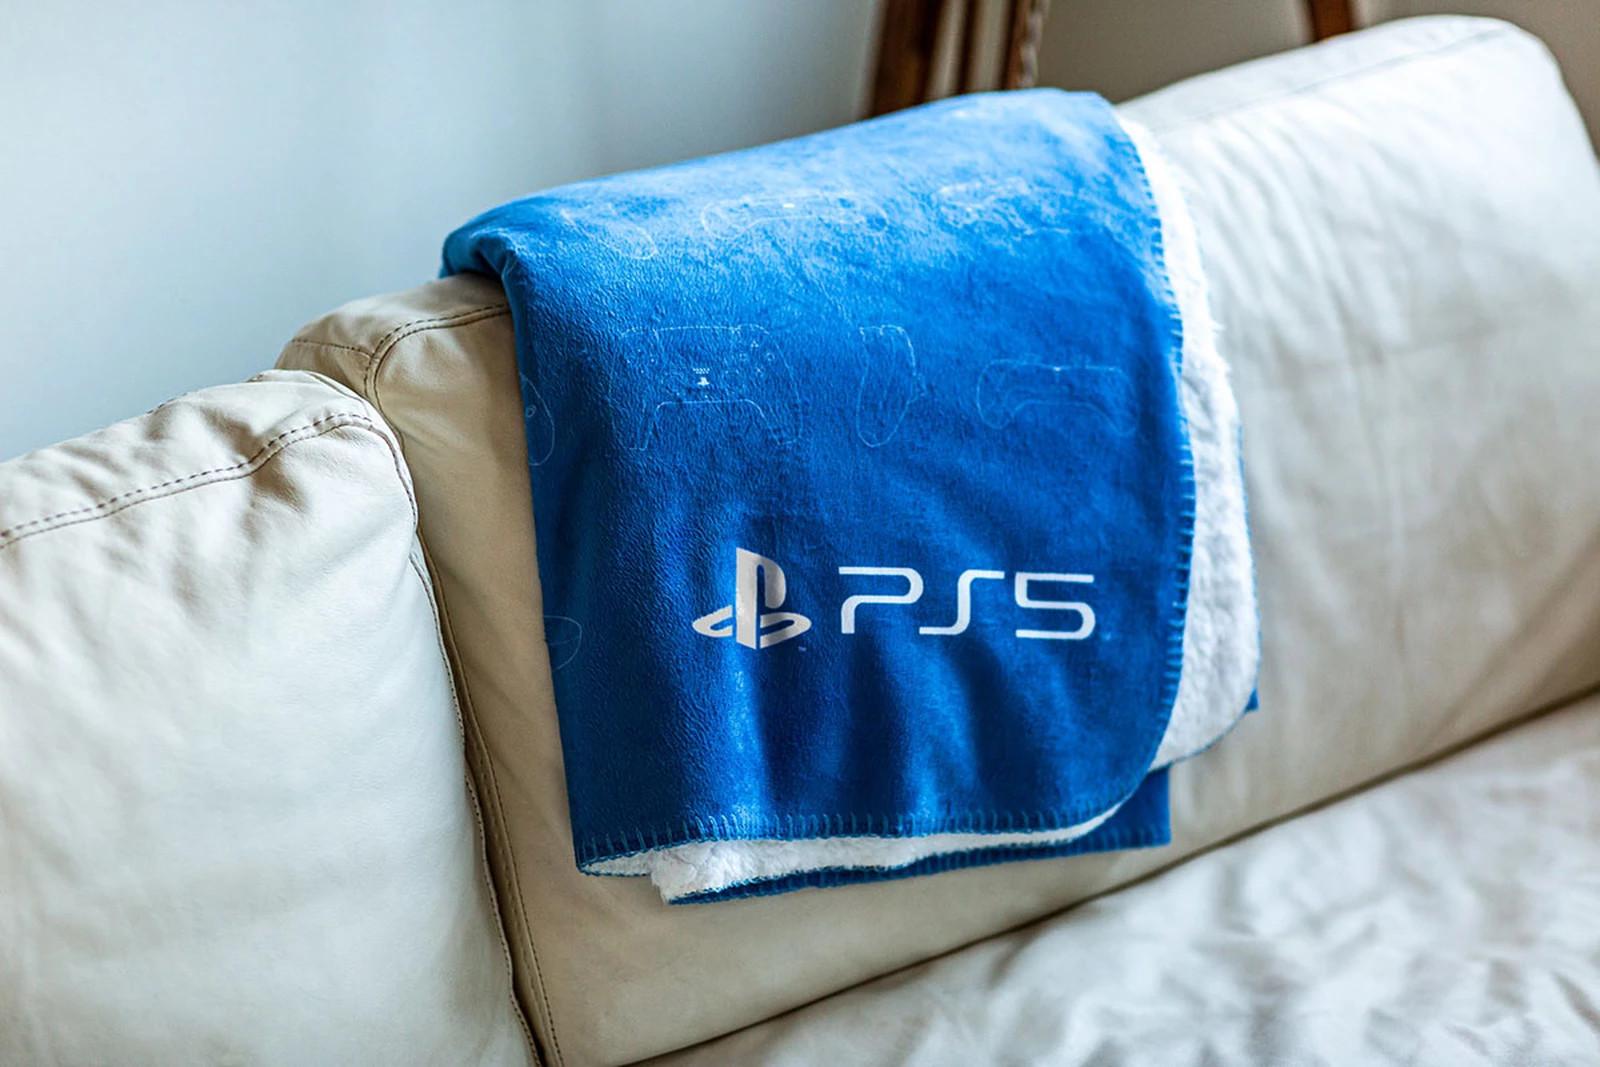 Sony PlayStation 5 merchandising